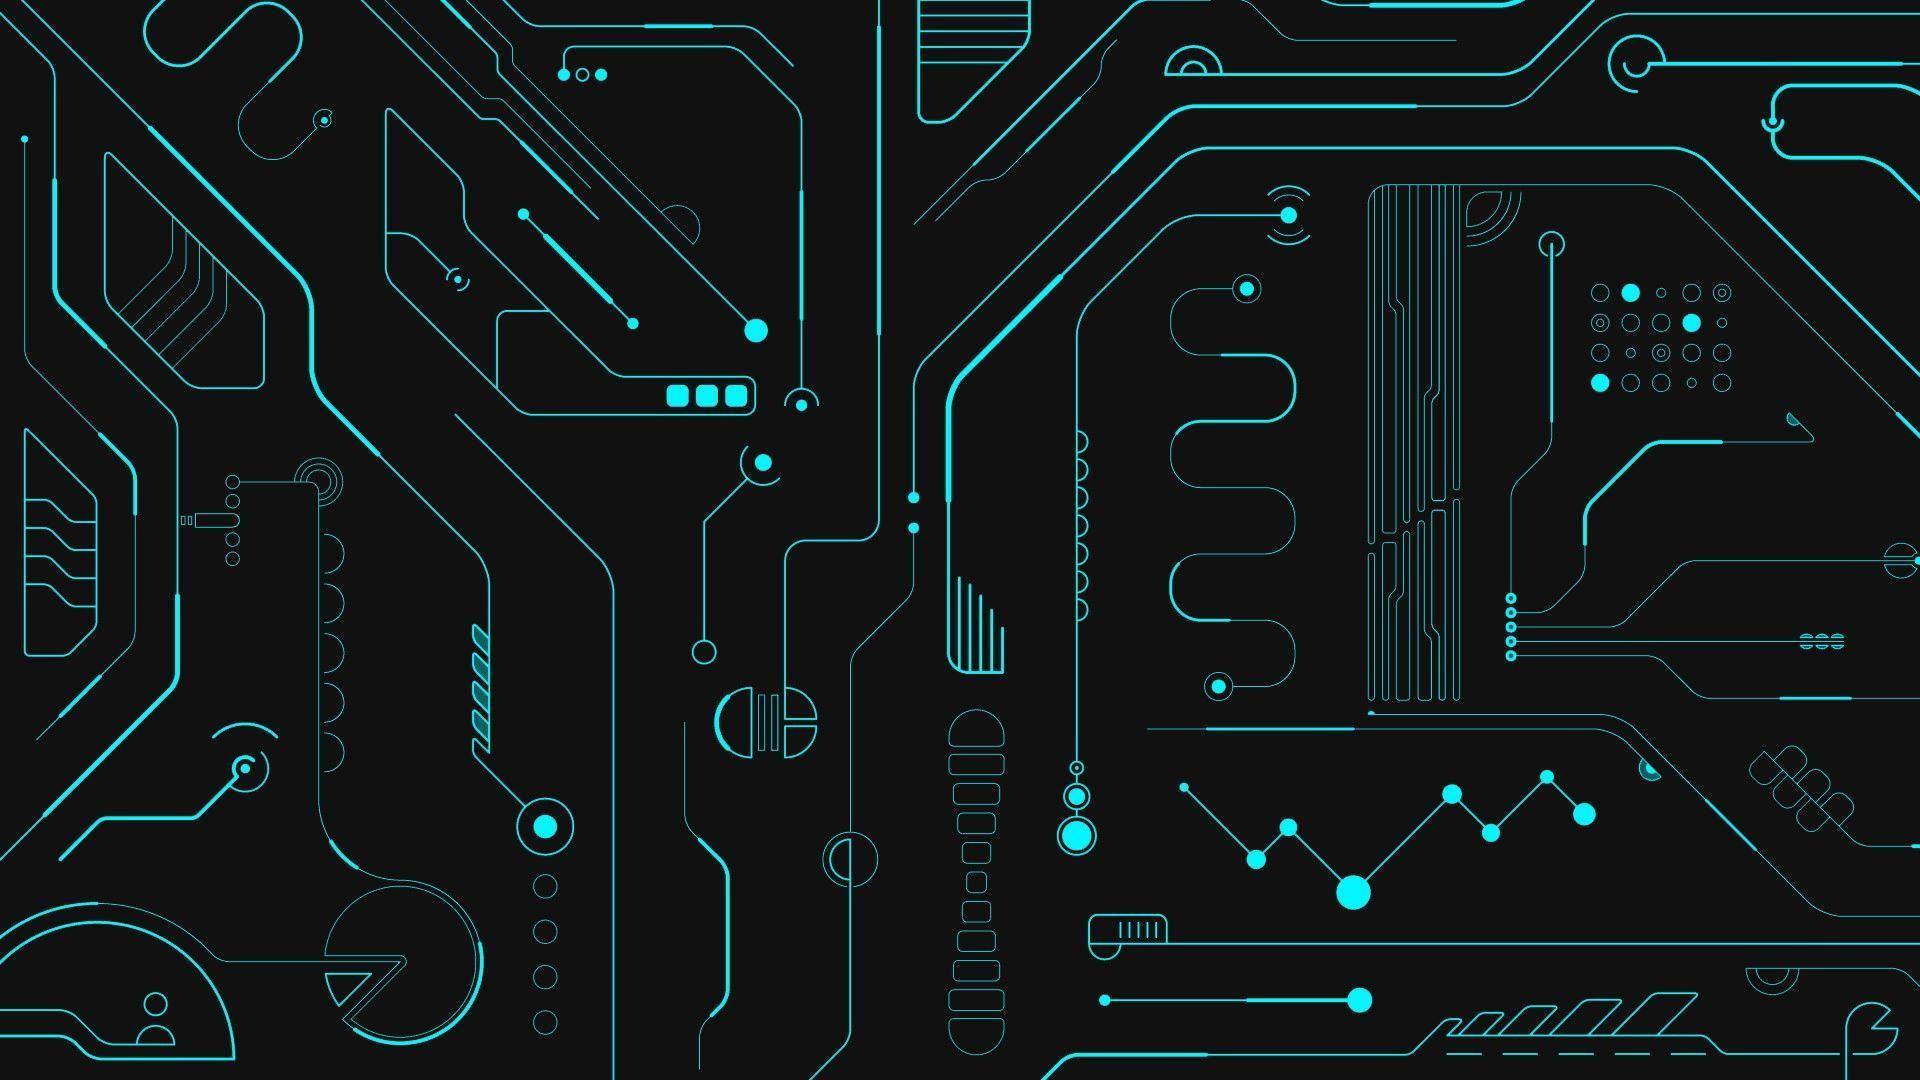 Circuito Hd : Design designs abstract interface interfaces wallpaper